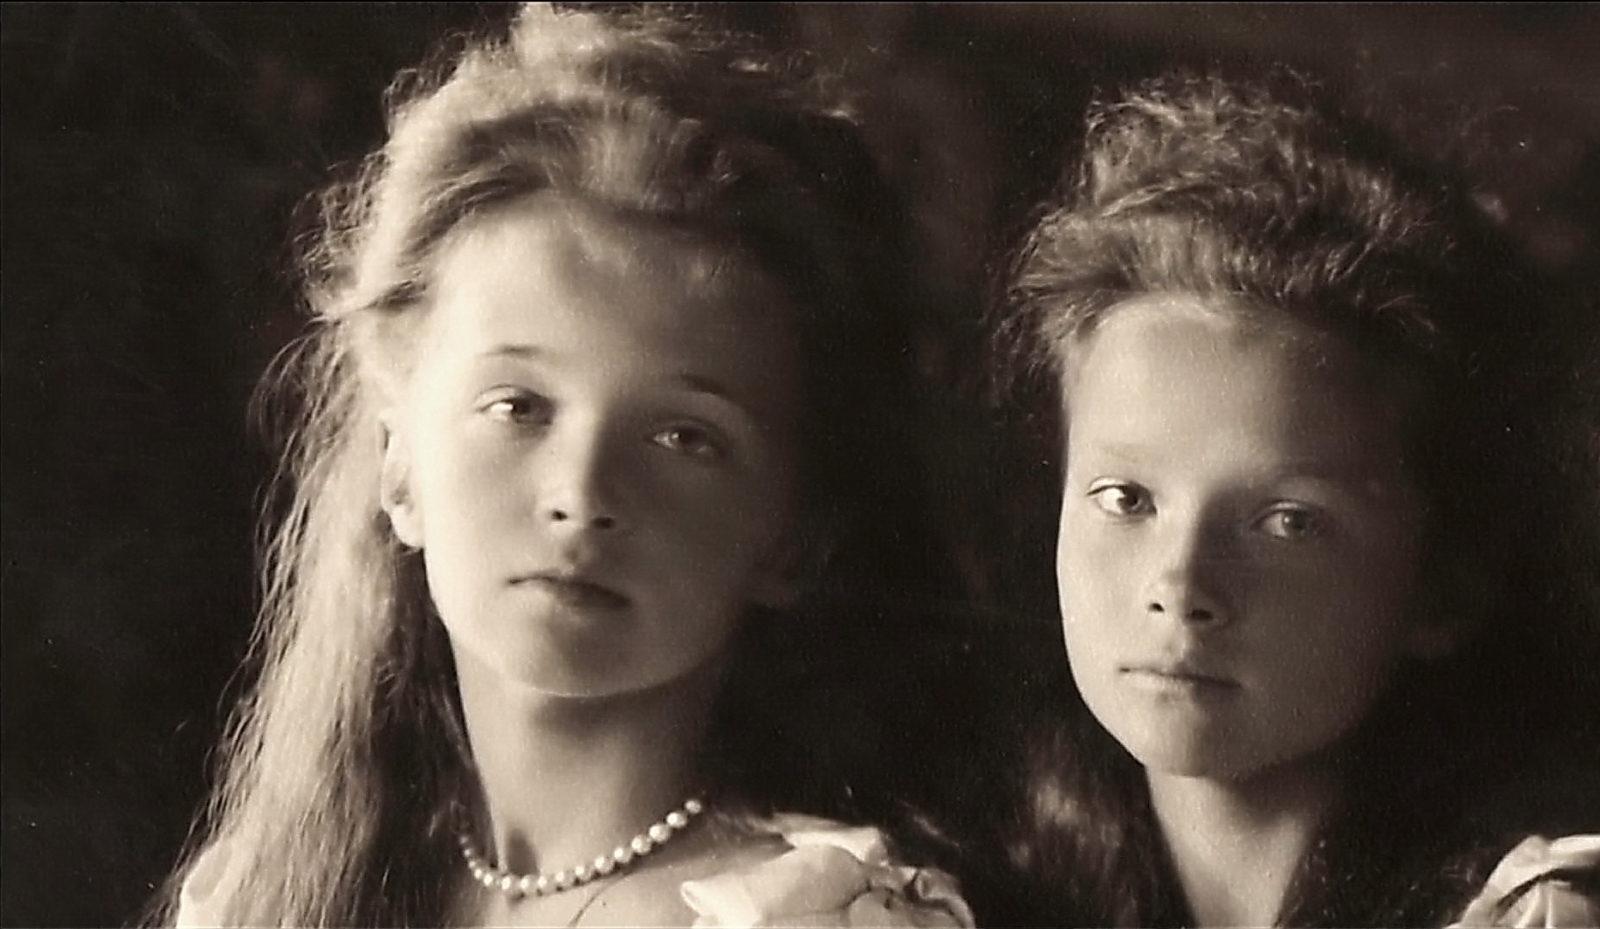 Grand duchesses Olga and Tatiana . 1906.